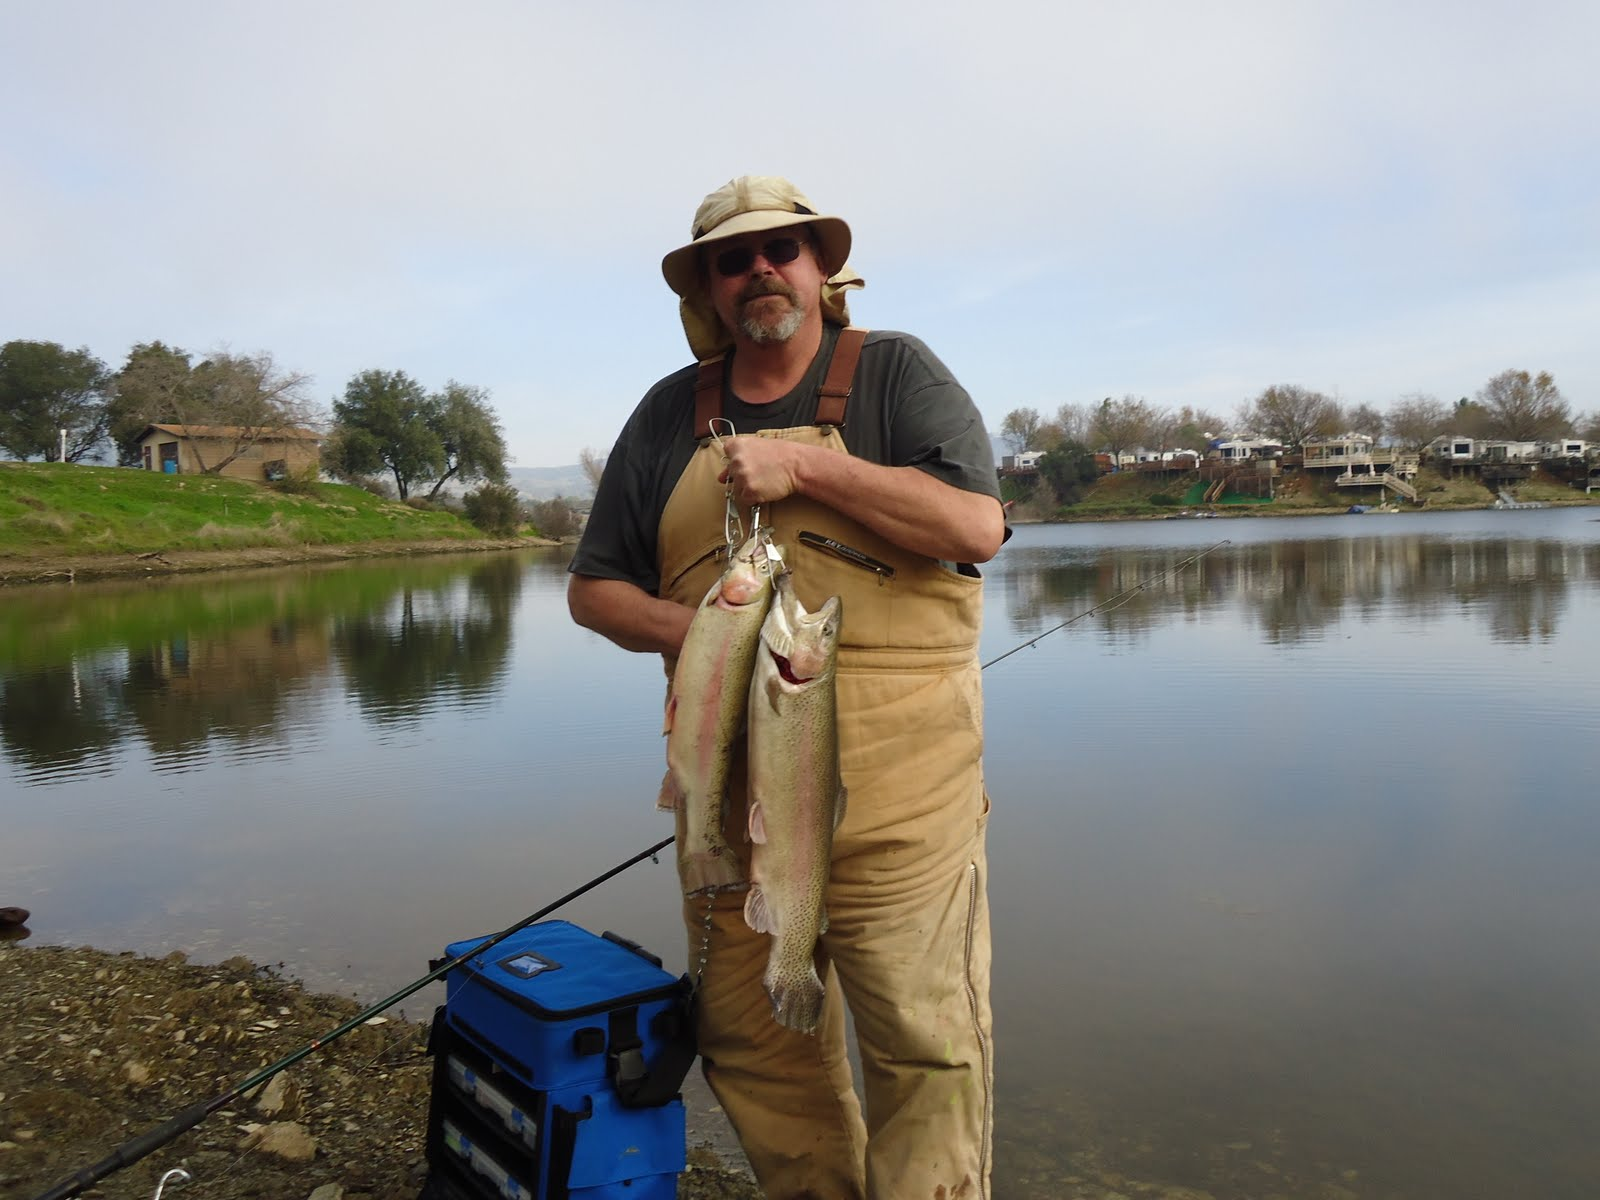 The mother lode fisherman lake amador fishing report 2 2 12 for Lake amador fishing report